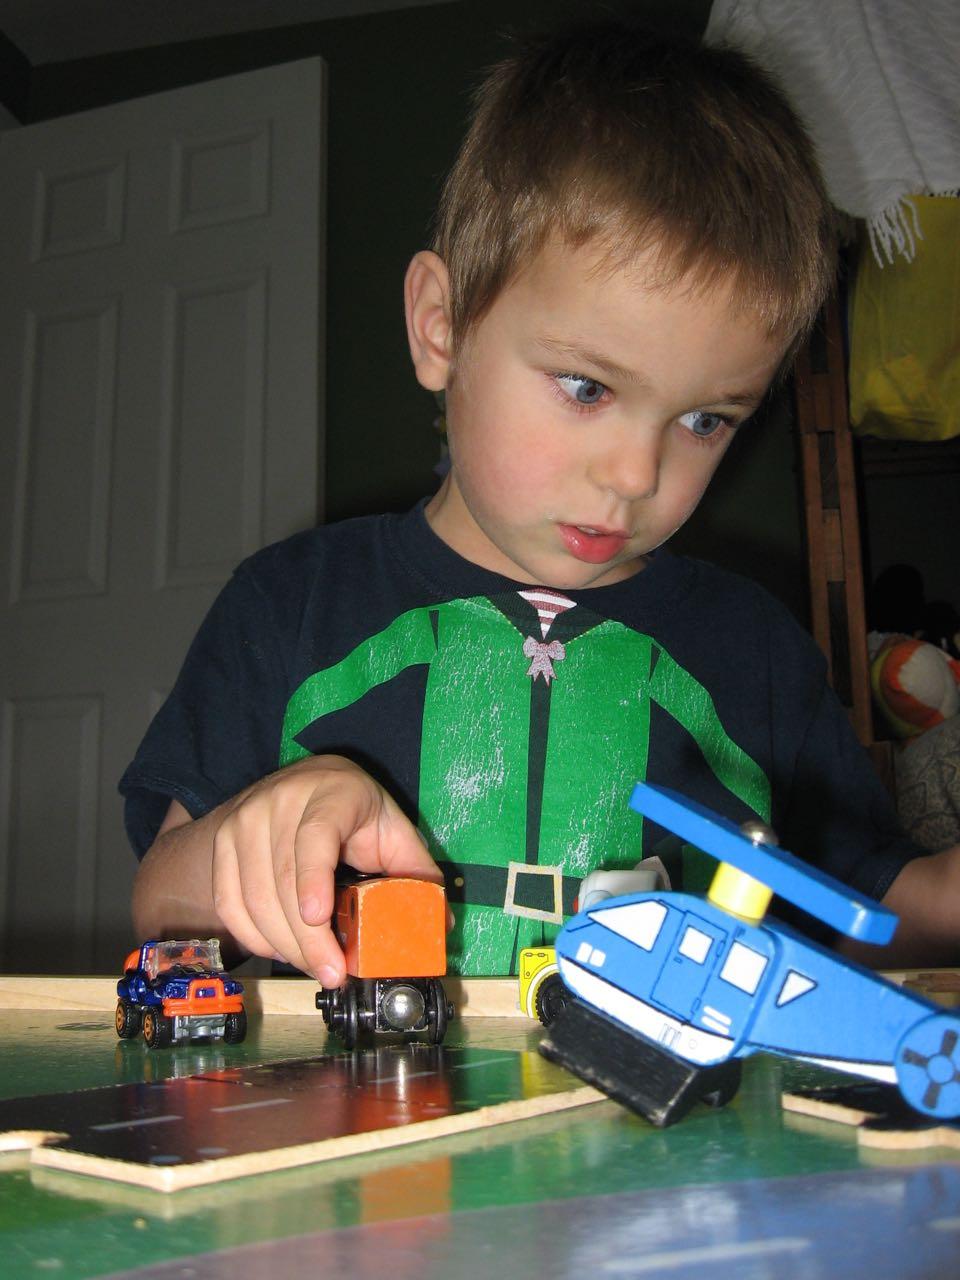 Train-copter